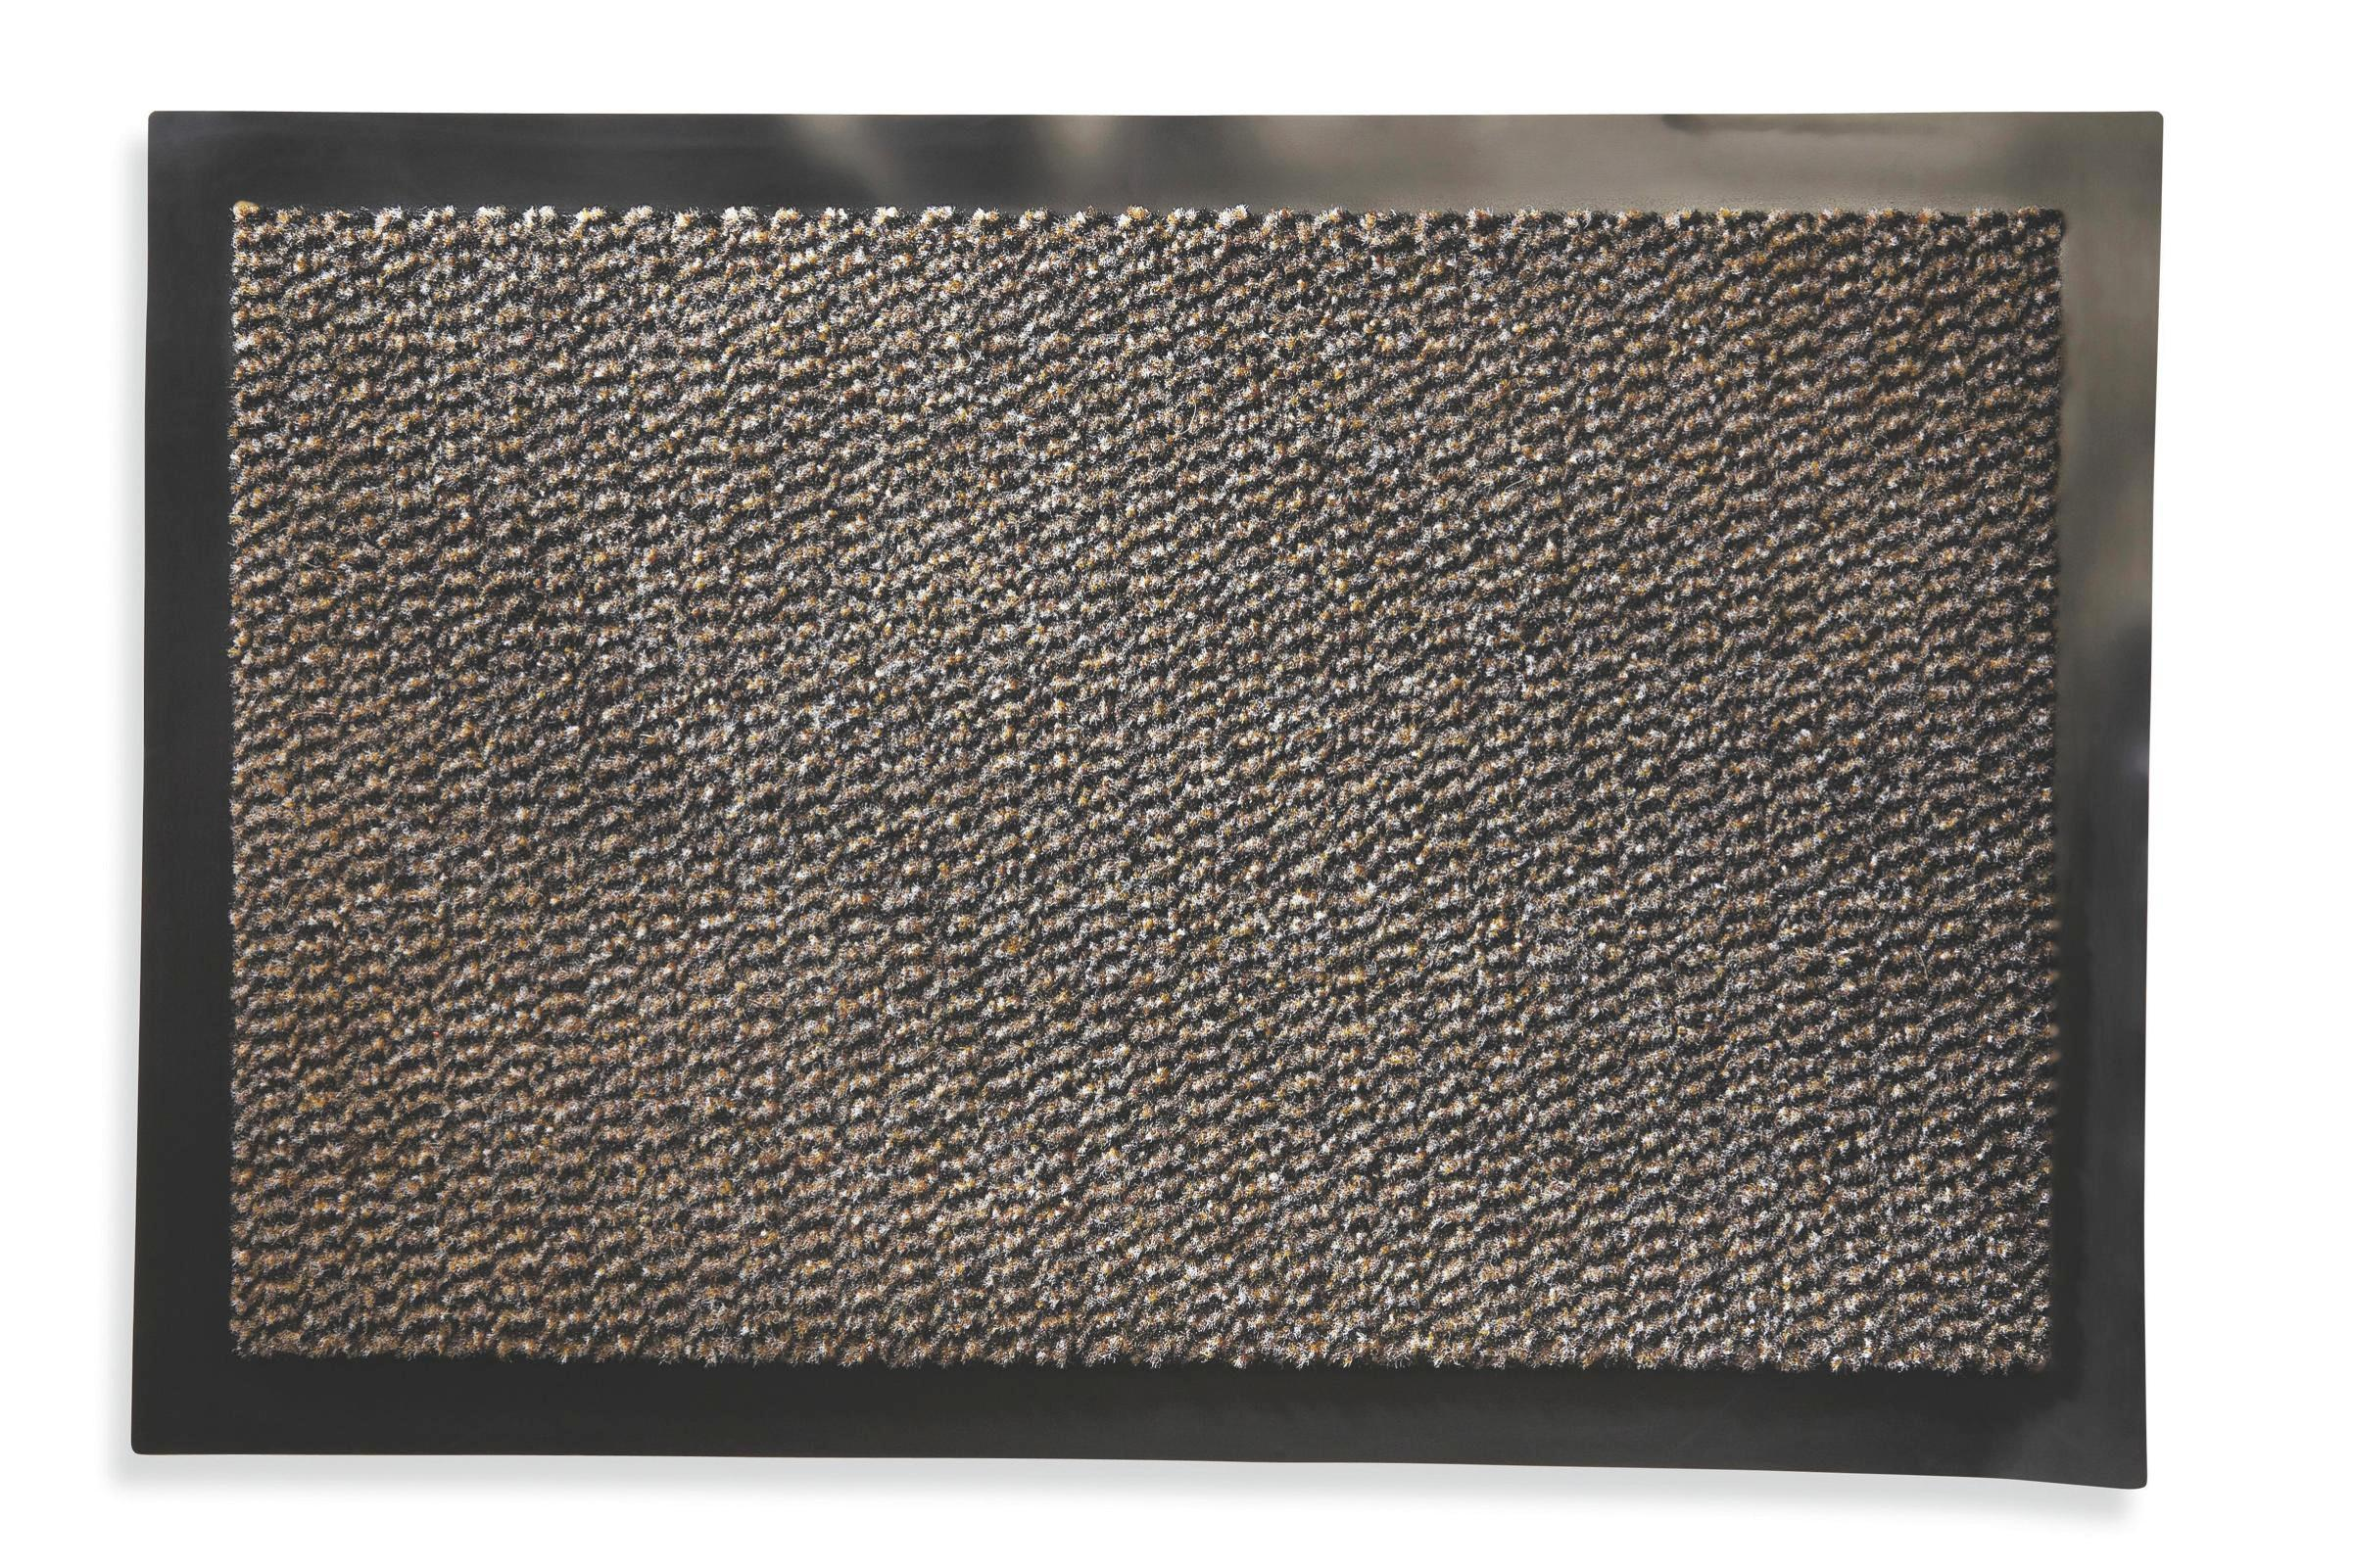 Fußmatte Klaus In Rost, ca. 40x60cm - Rostfarben, MODERN, Textil (40x60cm) - MÖMAX modern living